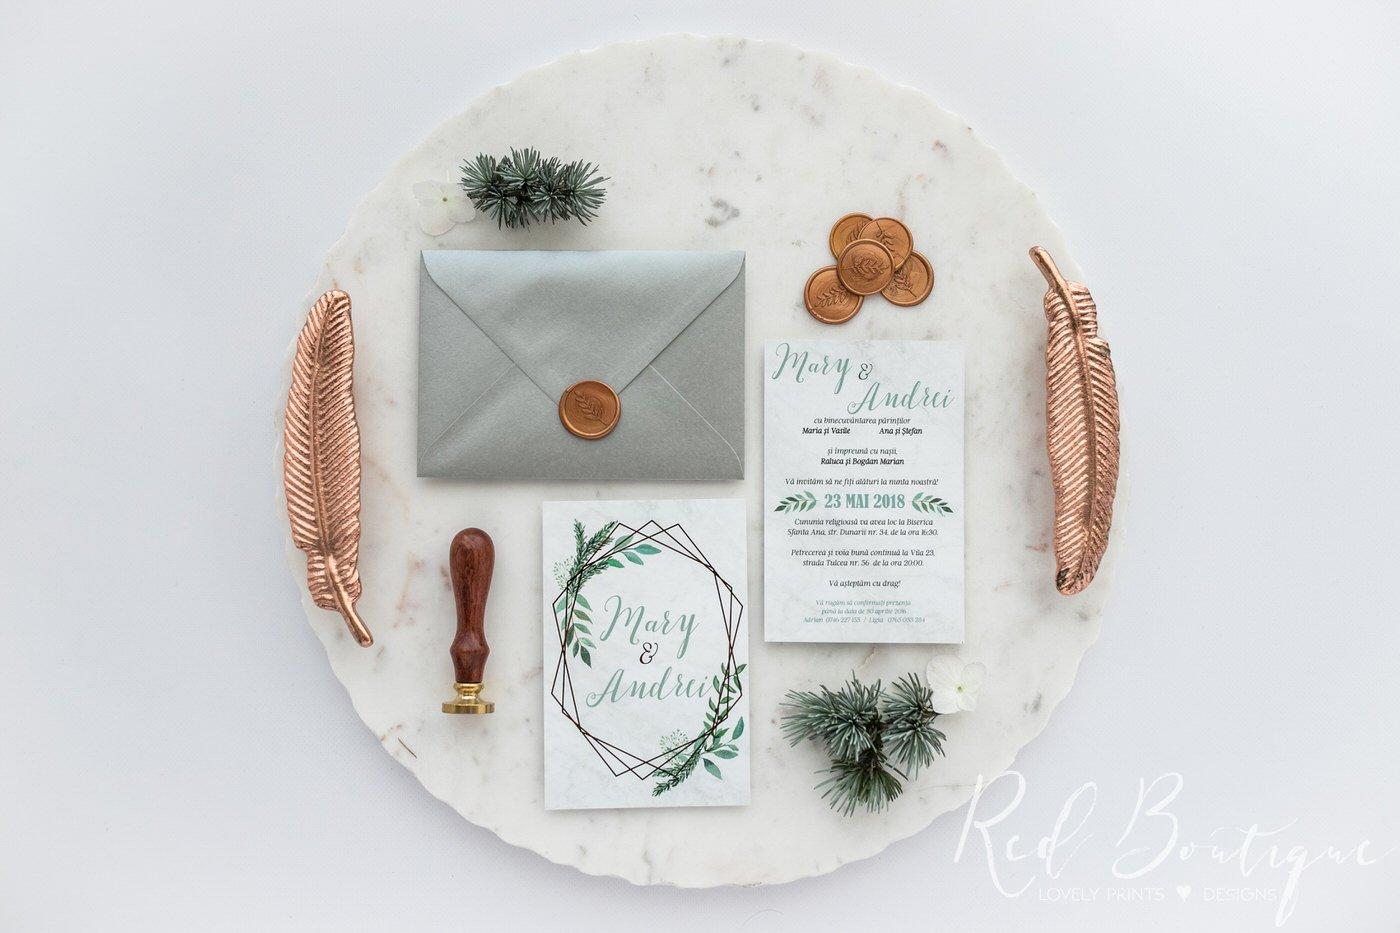 invitatie moderna cu frunze verzi pe carton mat catifelat si linii aurii